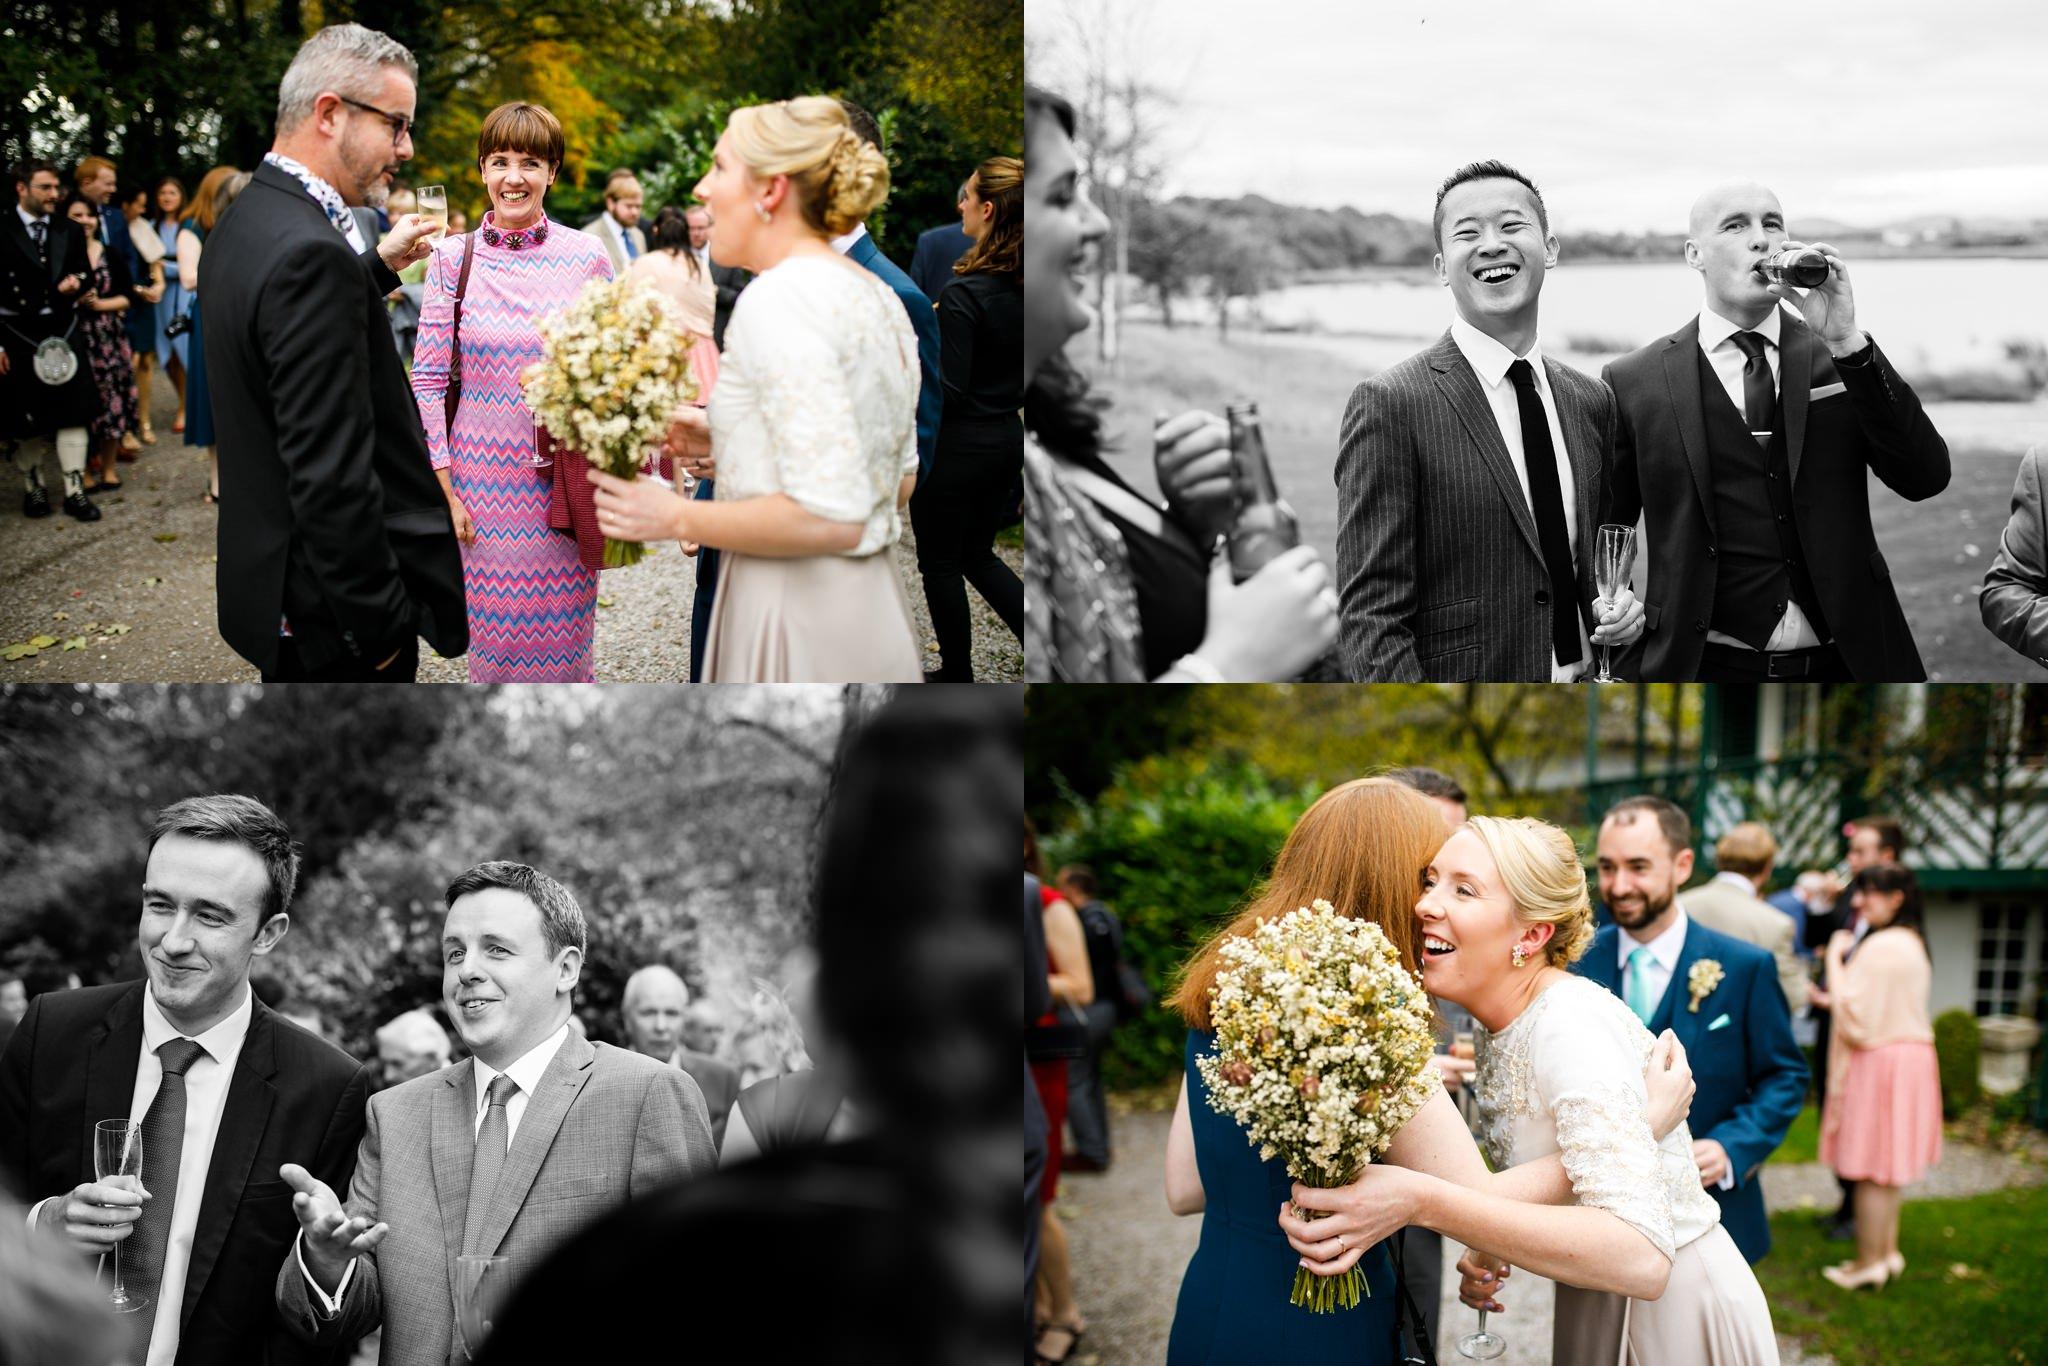 Elisha-Clarke-Photography-Dublin-City-Wedding_0077.jpg